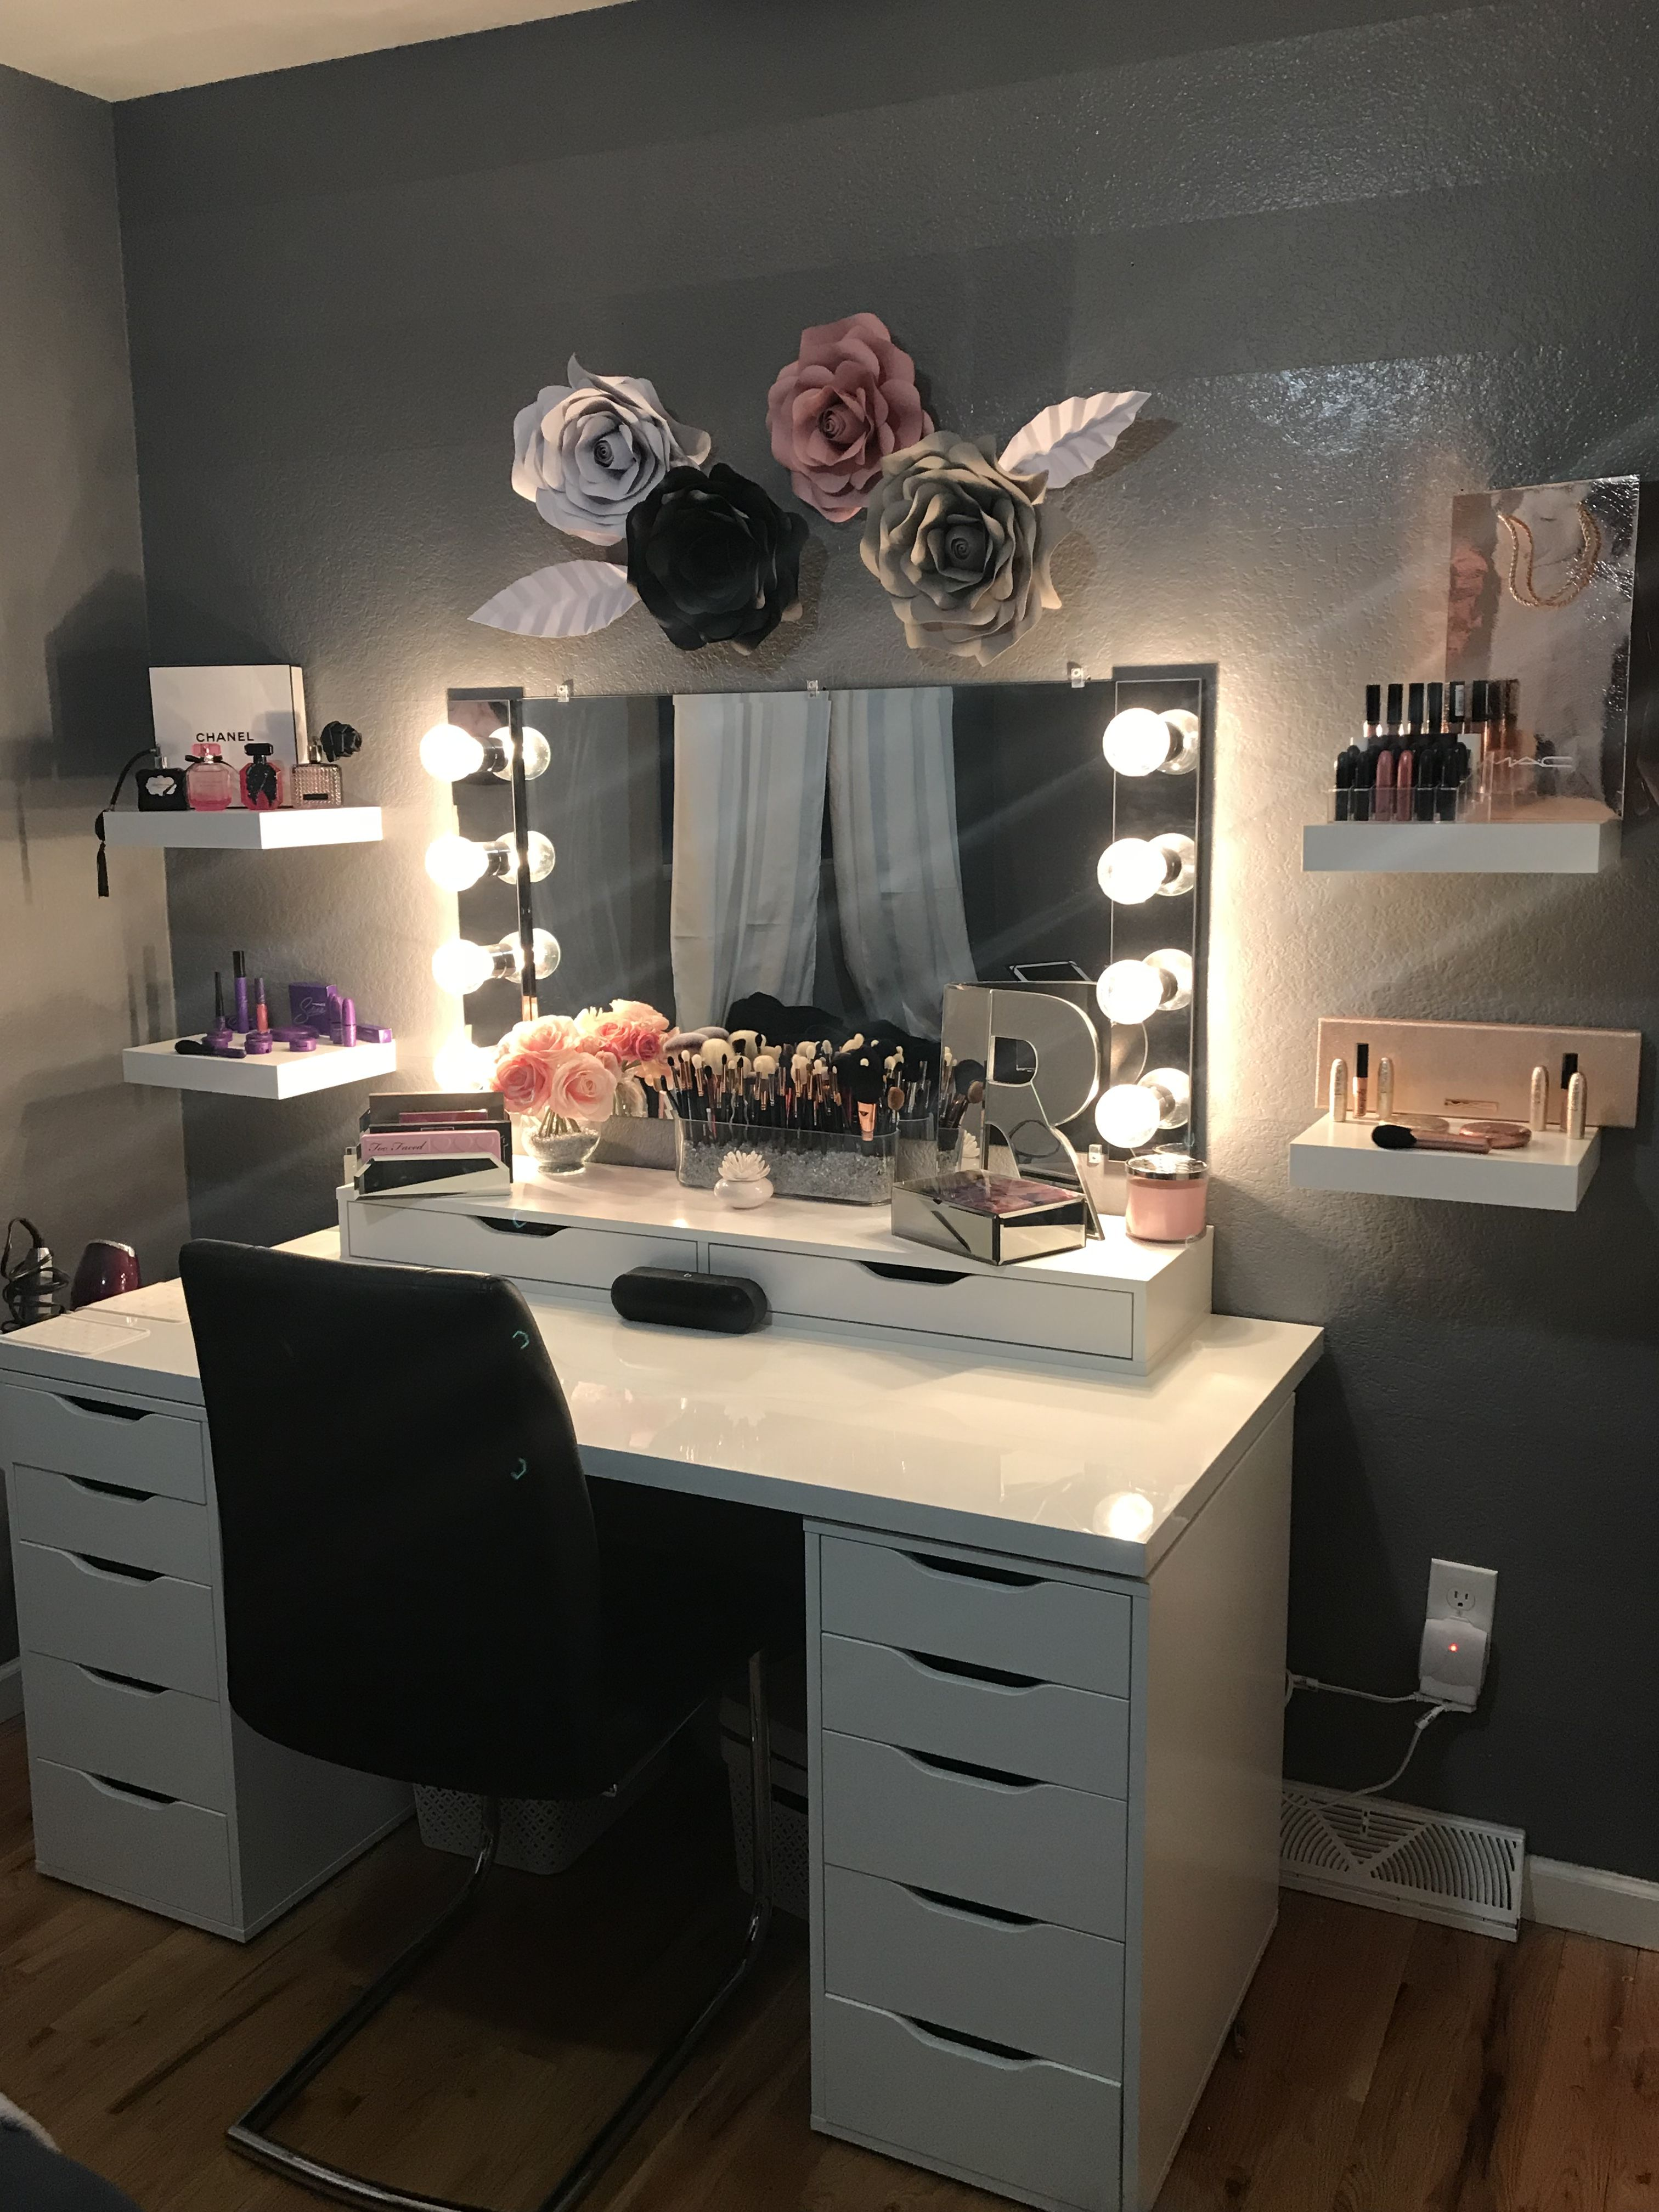 Vanity Beauty Room Ikea Alex Makeup Room Paper Roses Decor